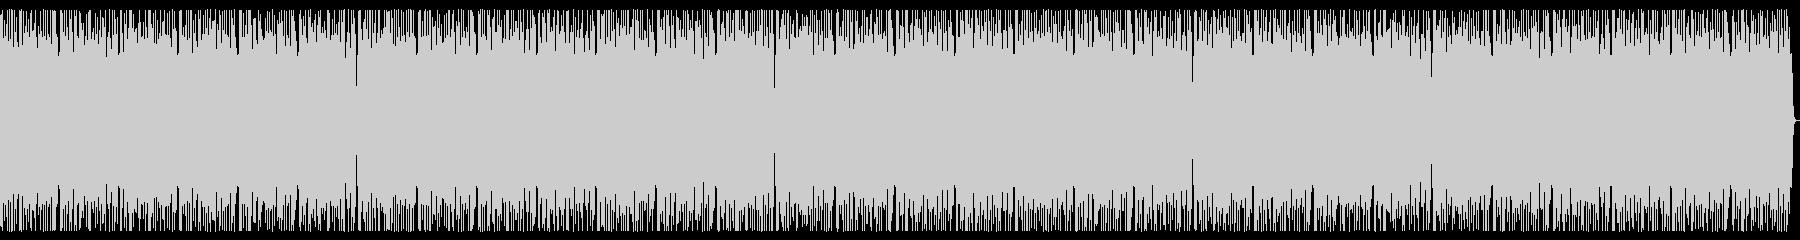 Smiley Cafe ♡ Soft Jazz 15 minutes ♡'s unreproduced waveform